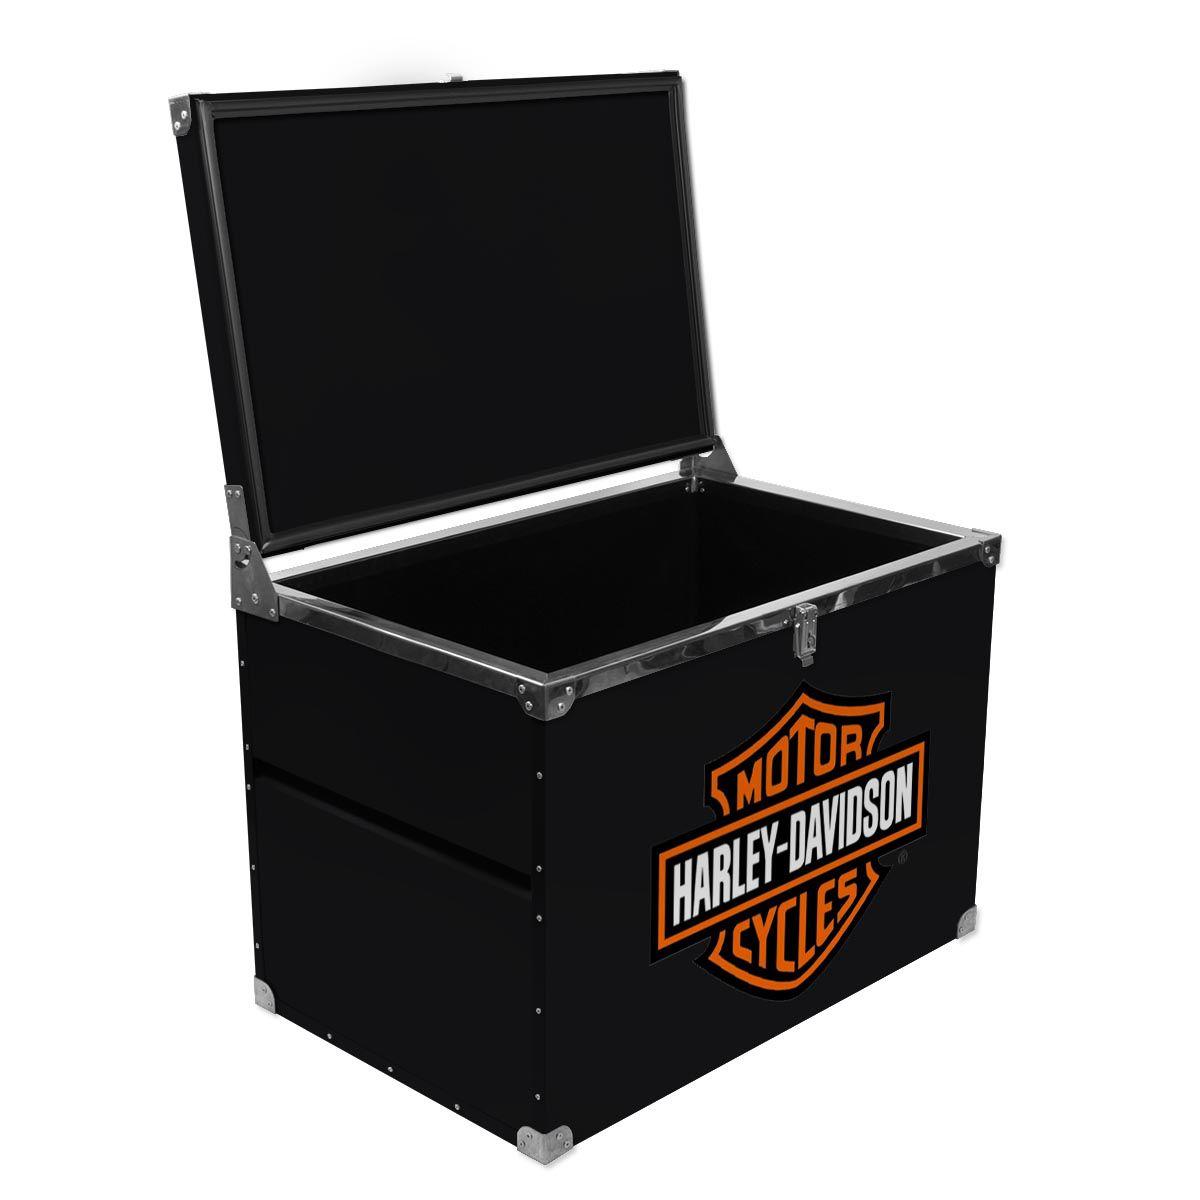 Caixa Térmica 180 Litros Harley Davidson